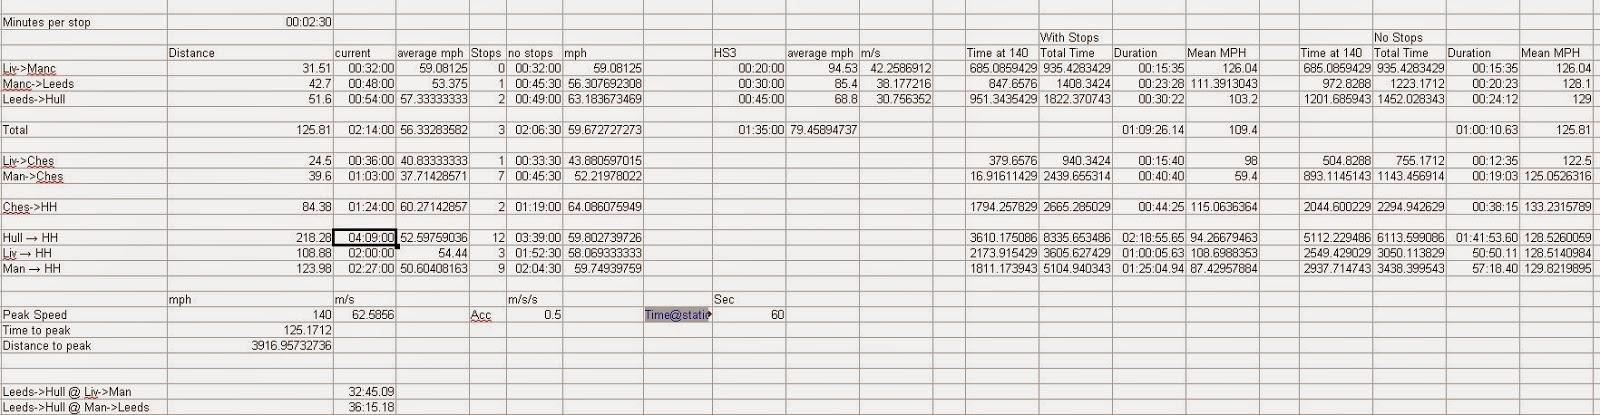 The OpenOffice Calc spread sheet can be found here https://drive.google.com/file/d/0BzqZlKsgcriVVFlWamFSSDFxSlU/view?usp=sharing